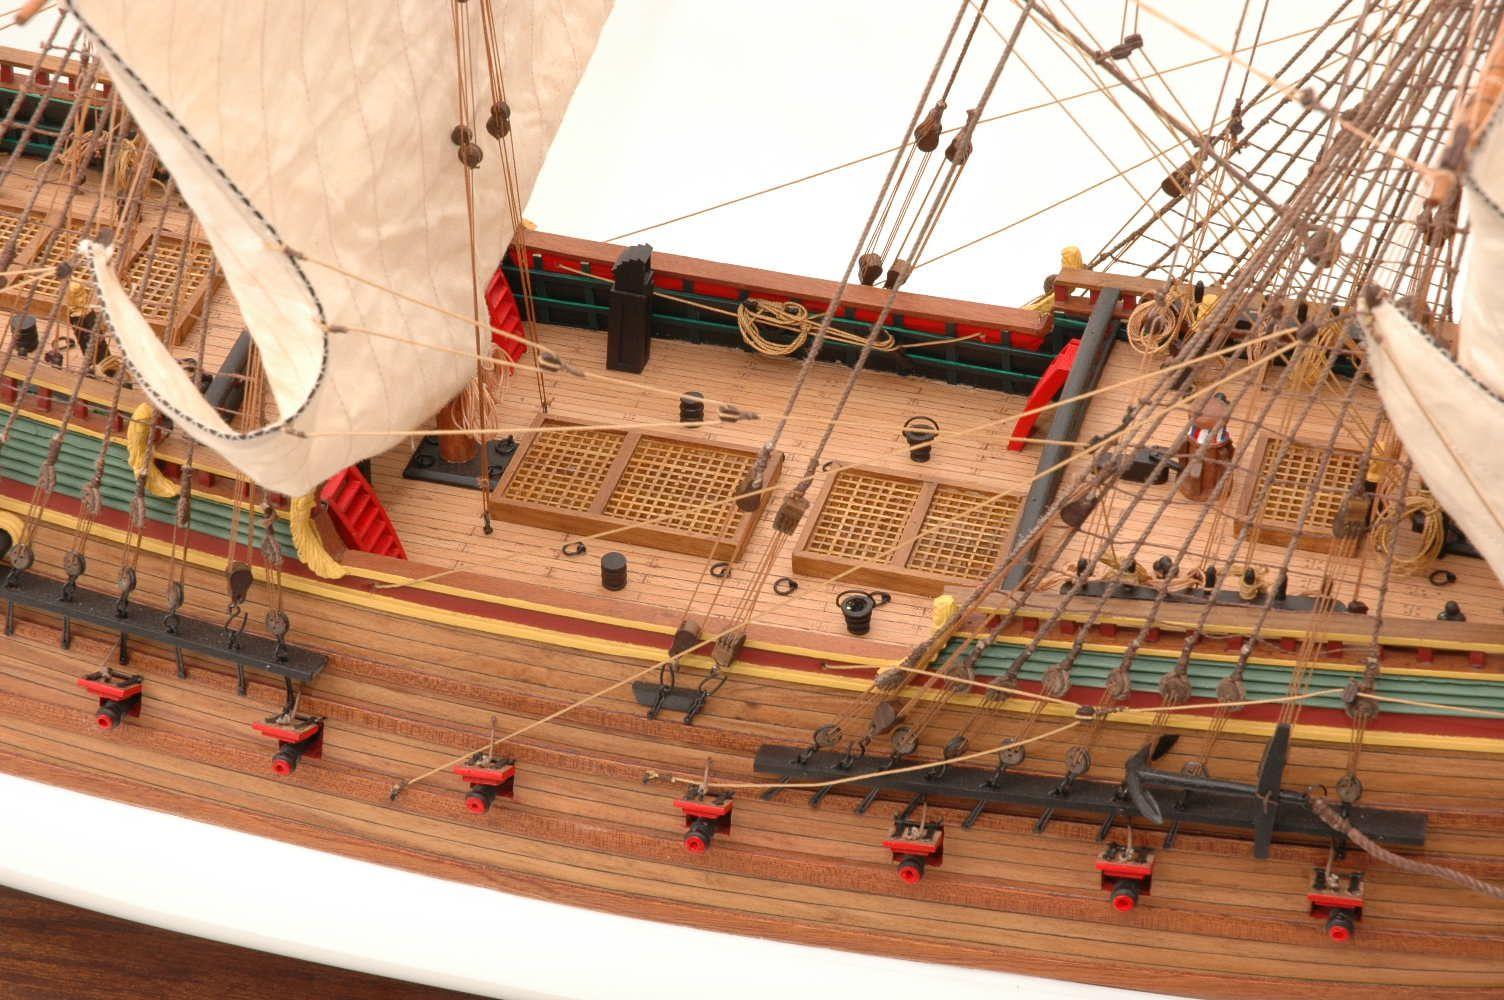 228-6947-Batavia-model-ship-Premier-Range